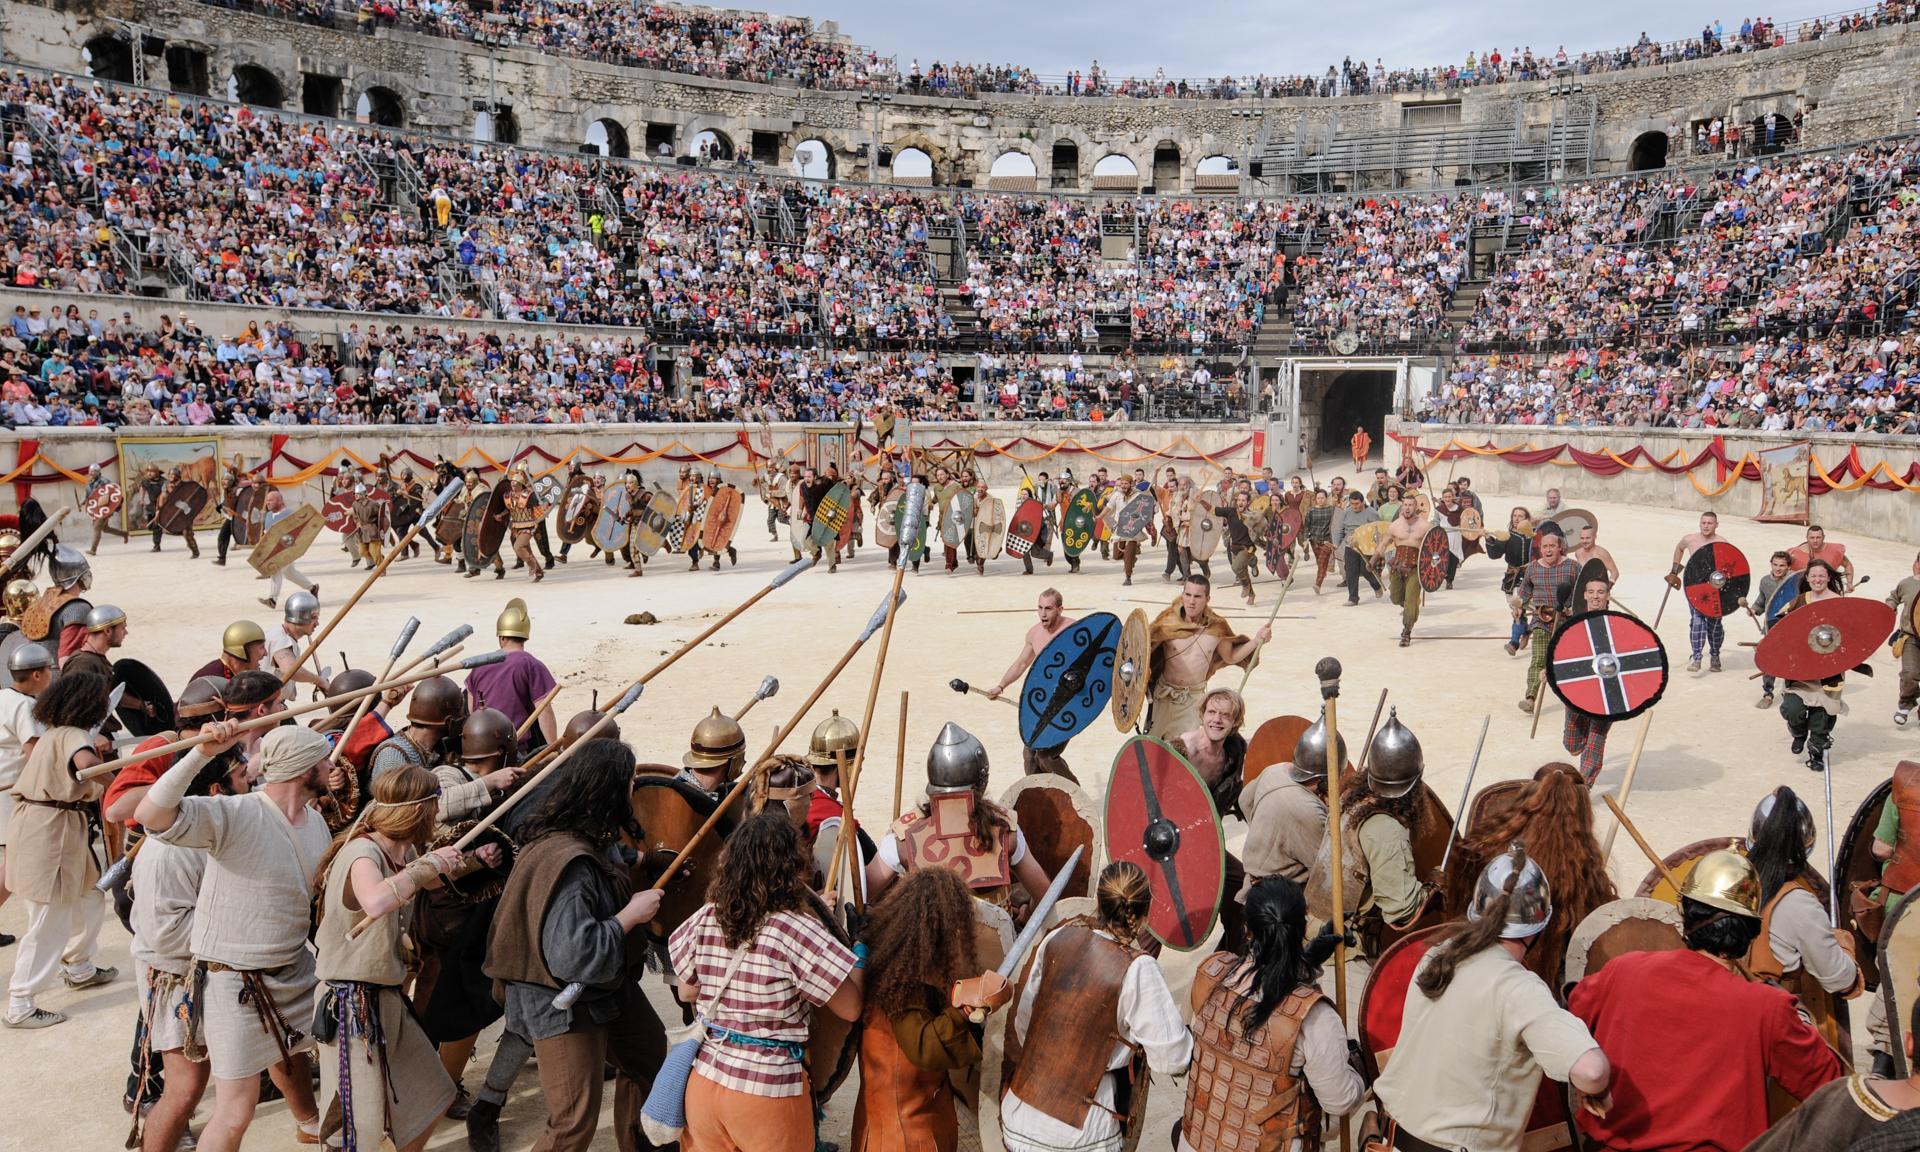 'I'm Spartacus!': gladiators galore at Nîmes' Great Roman Games